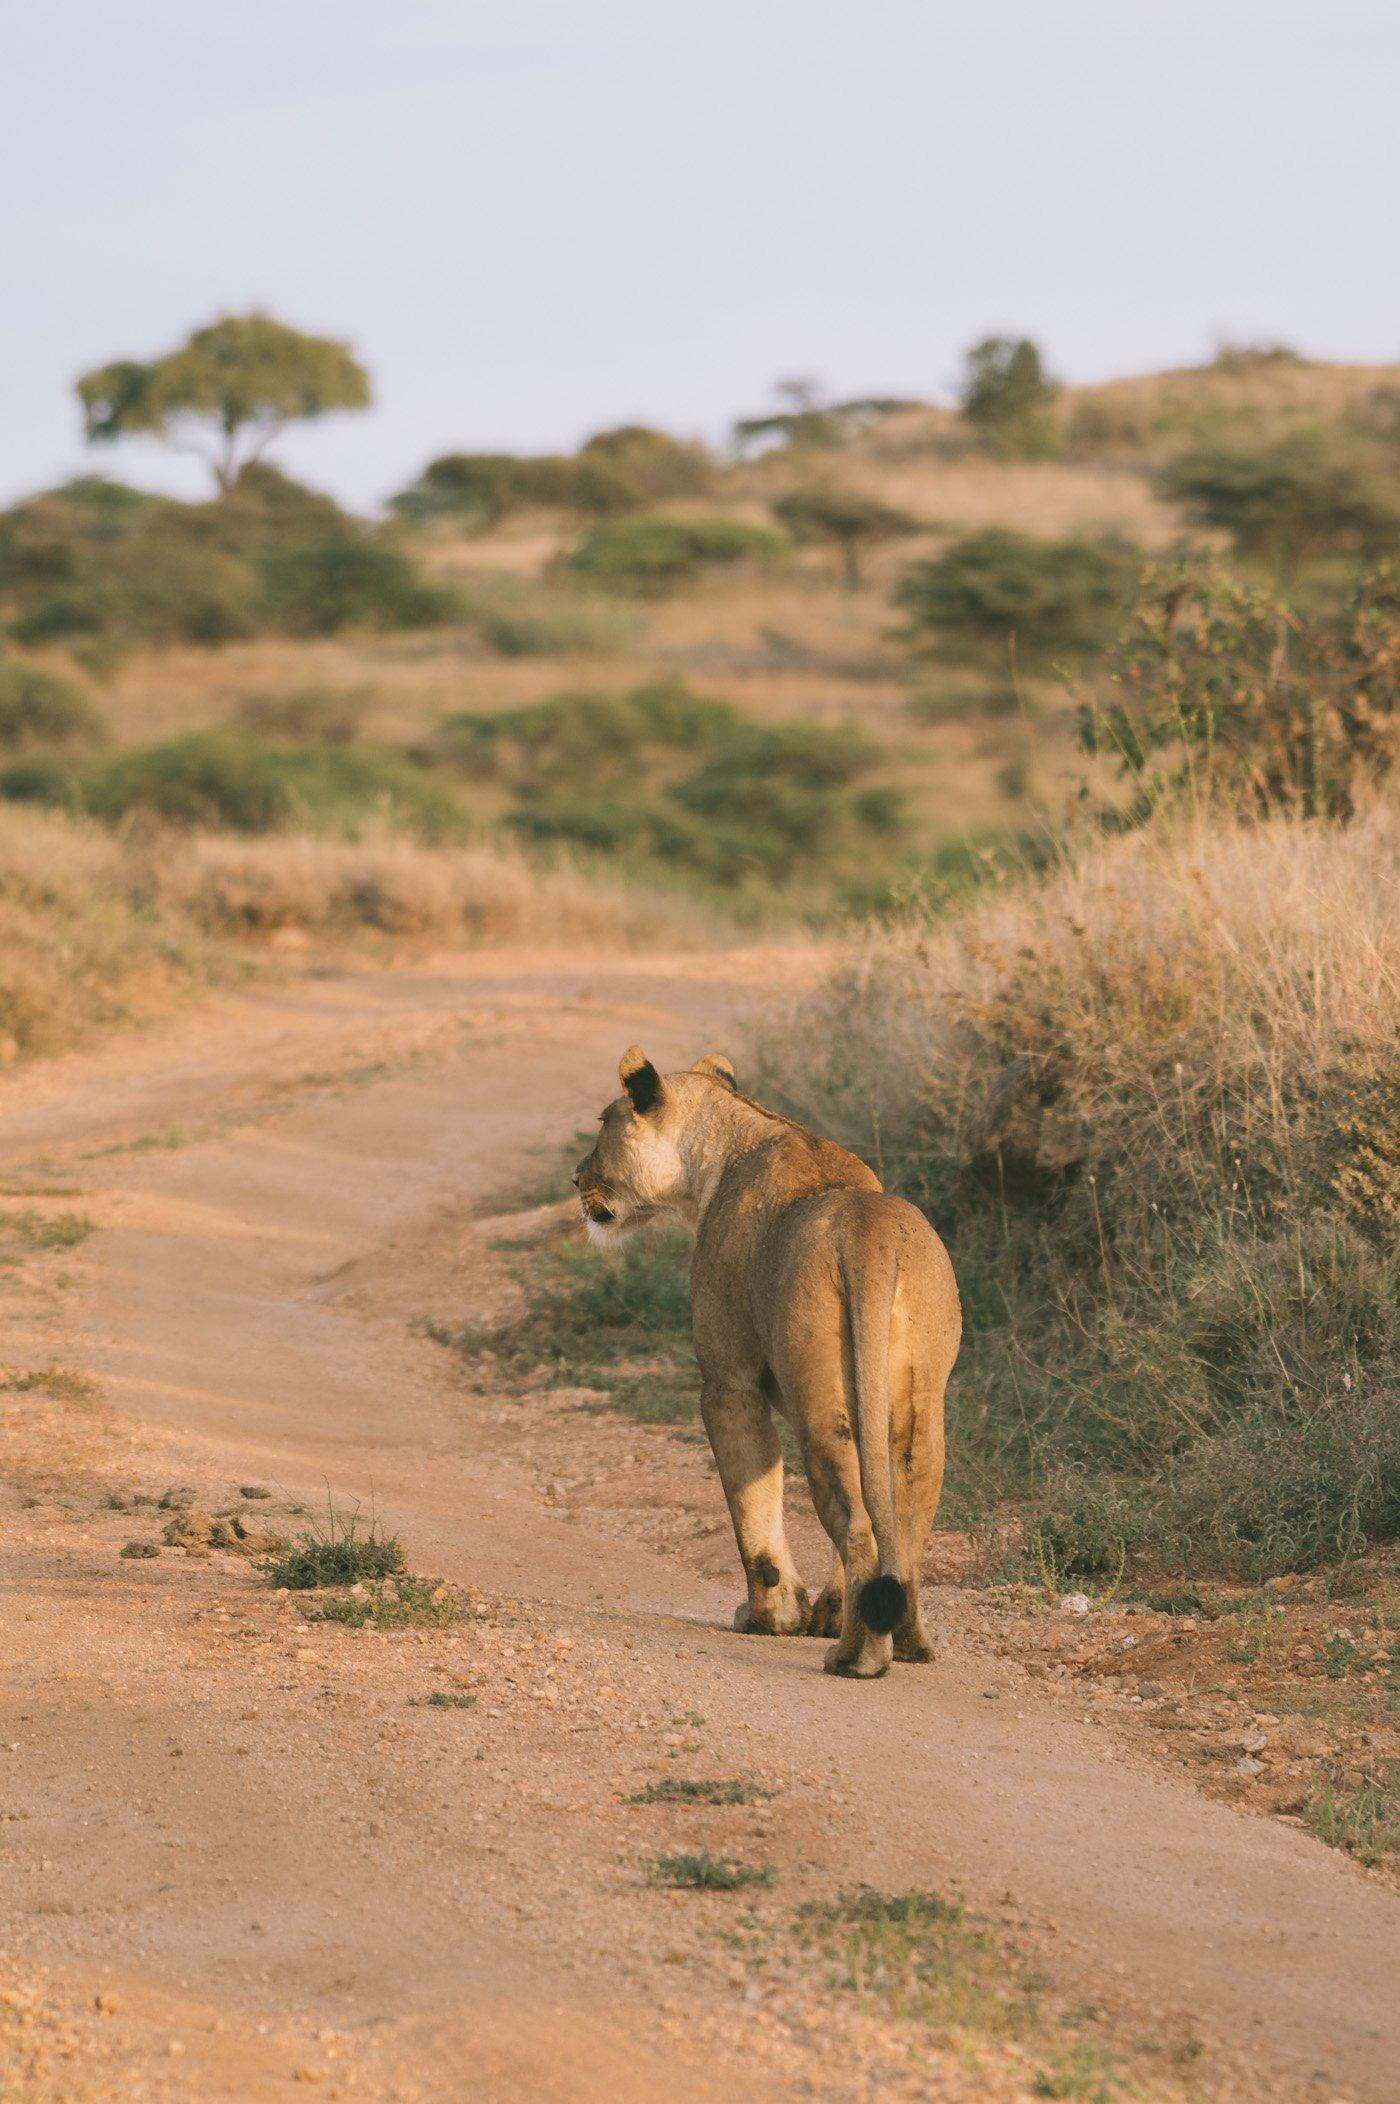 Lioness at Lewa Conservancy Kenya